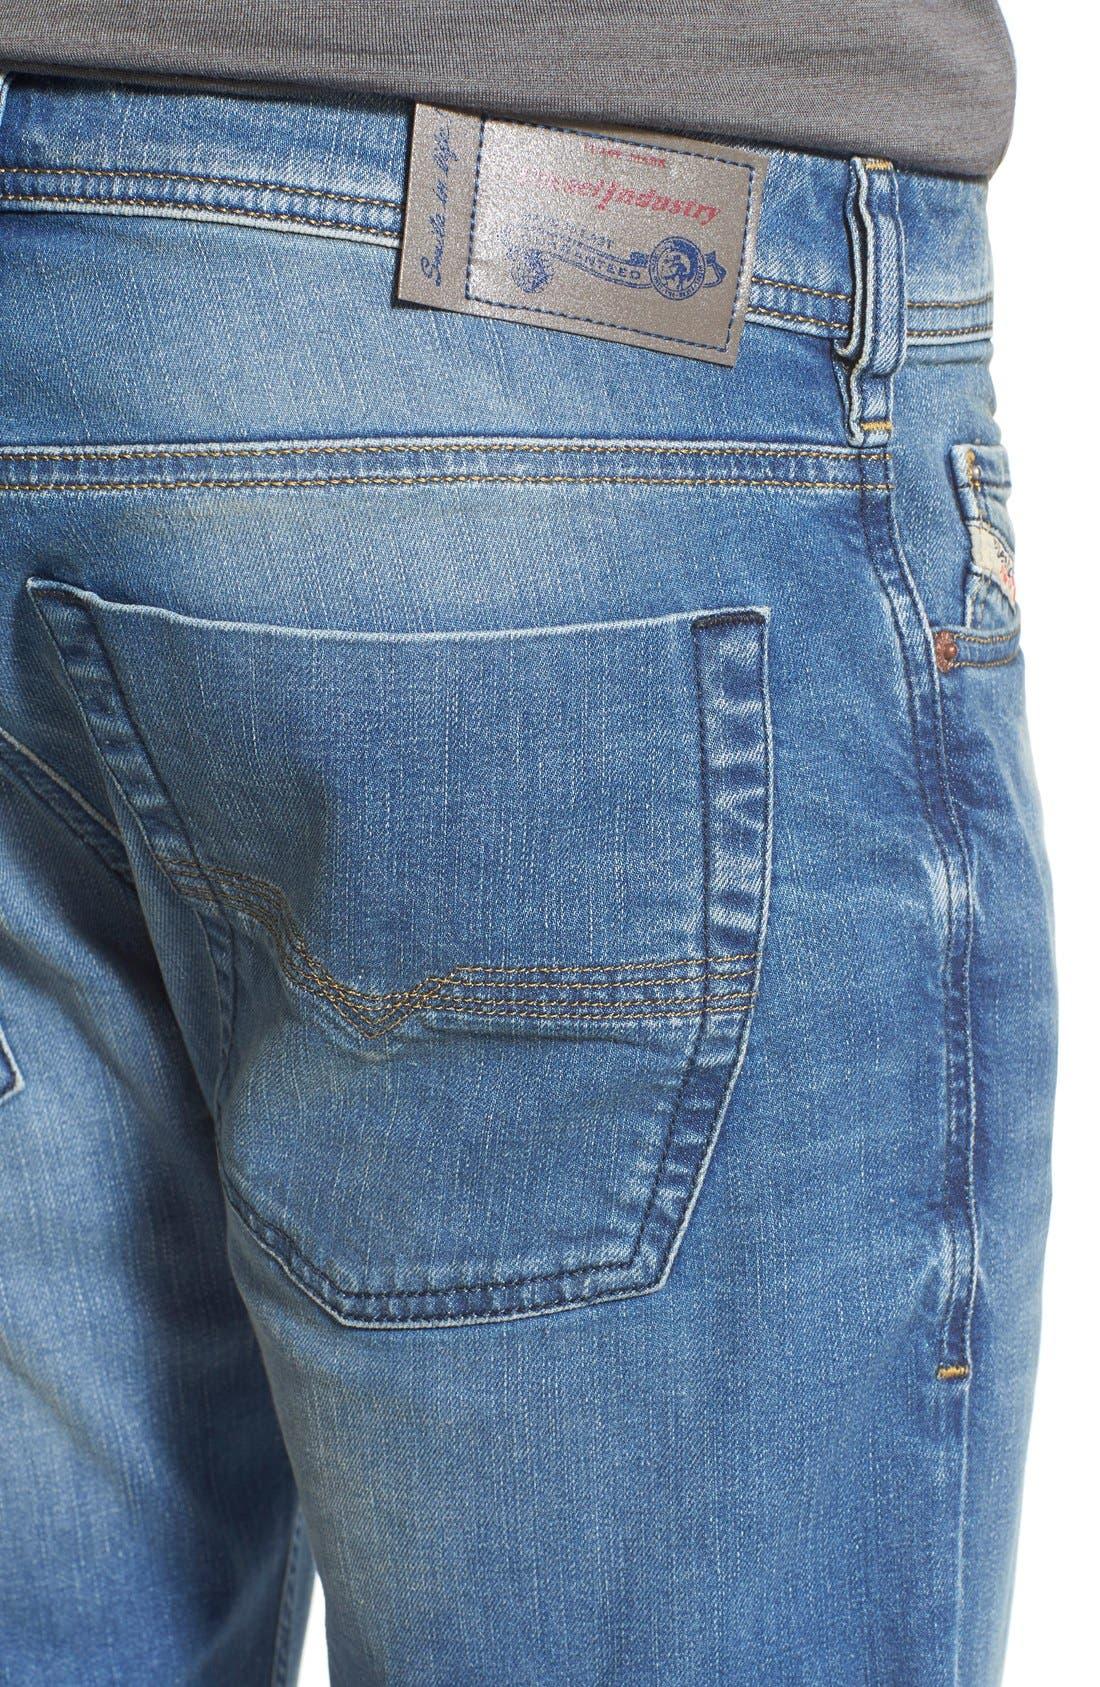 'Zatiny' Bootcut Jeans,                             Alternate thumbnail 5, color,                             400